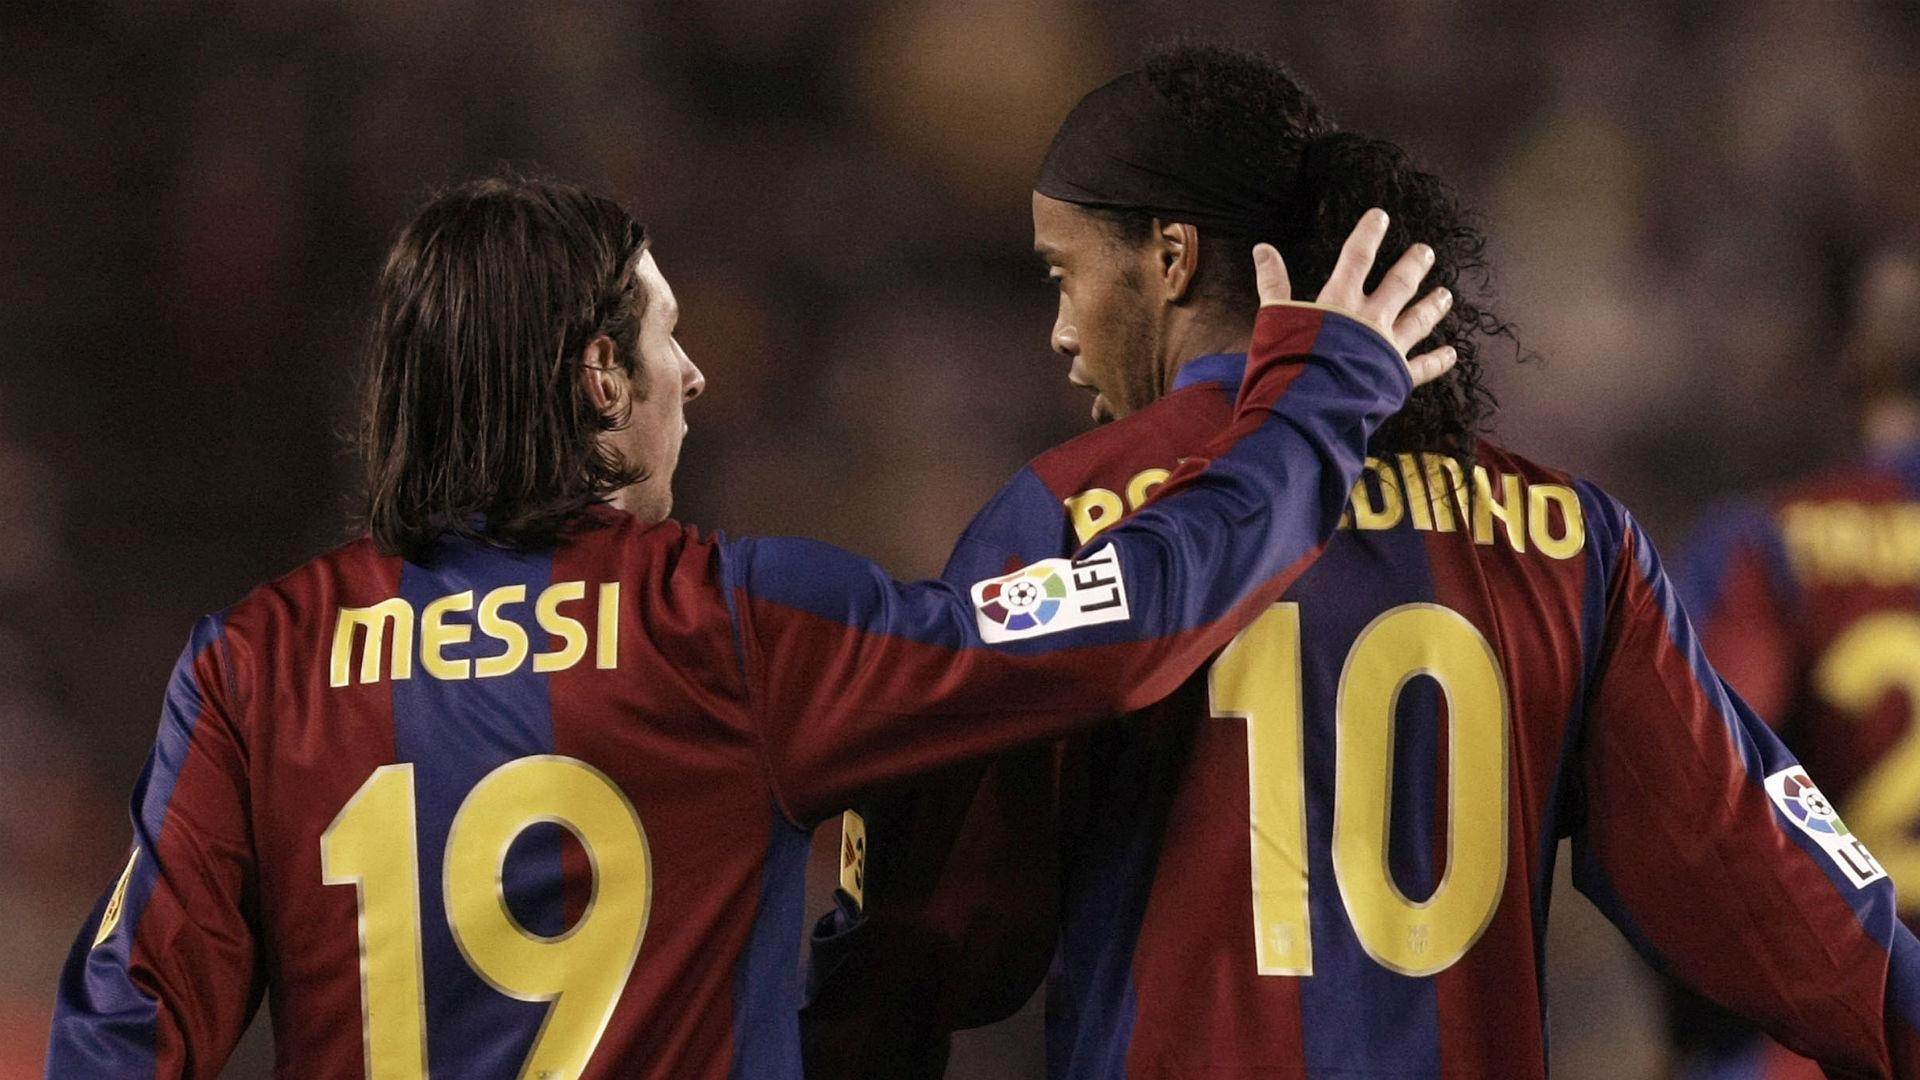 Manchester United's Shoretire emulating Messi and Ronaldinho's playing style